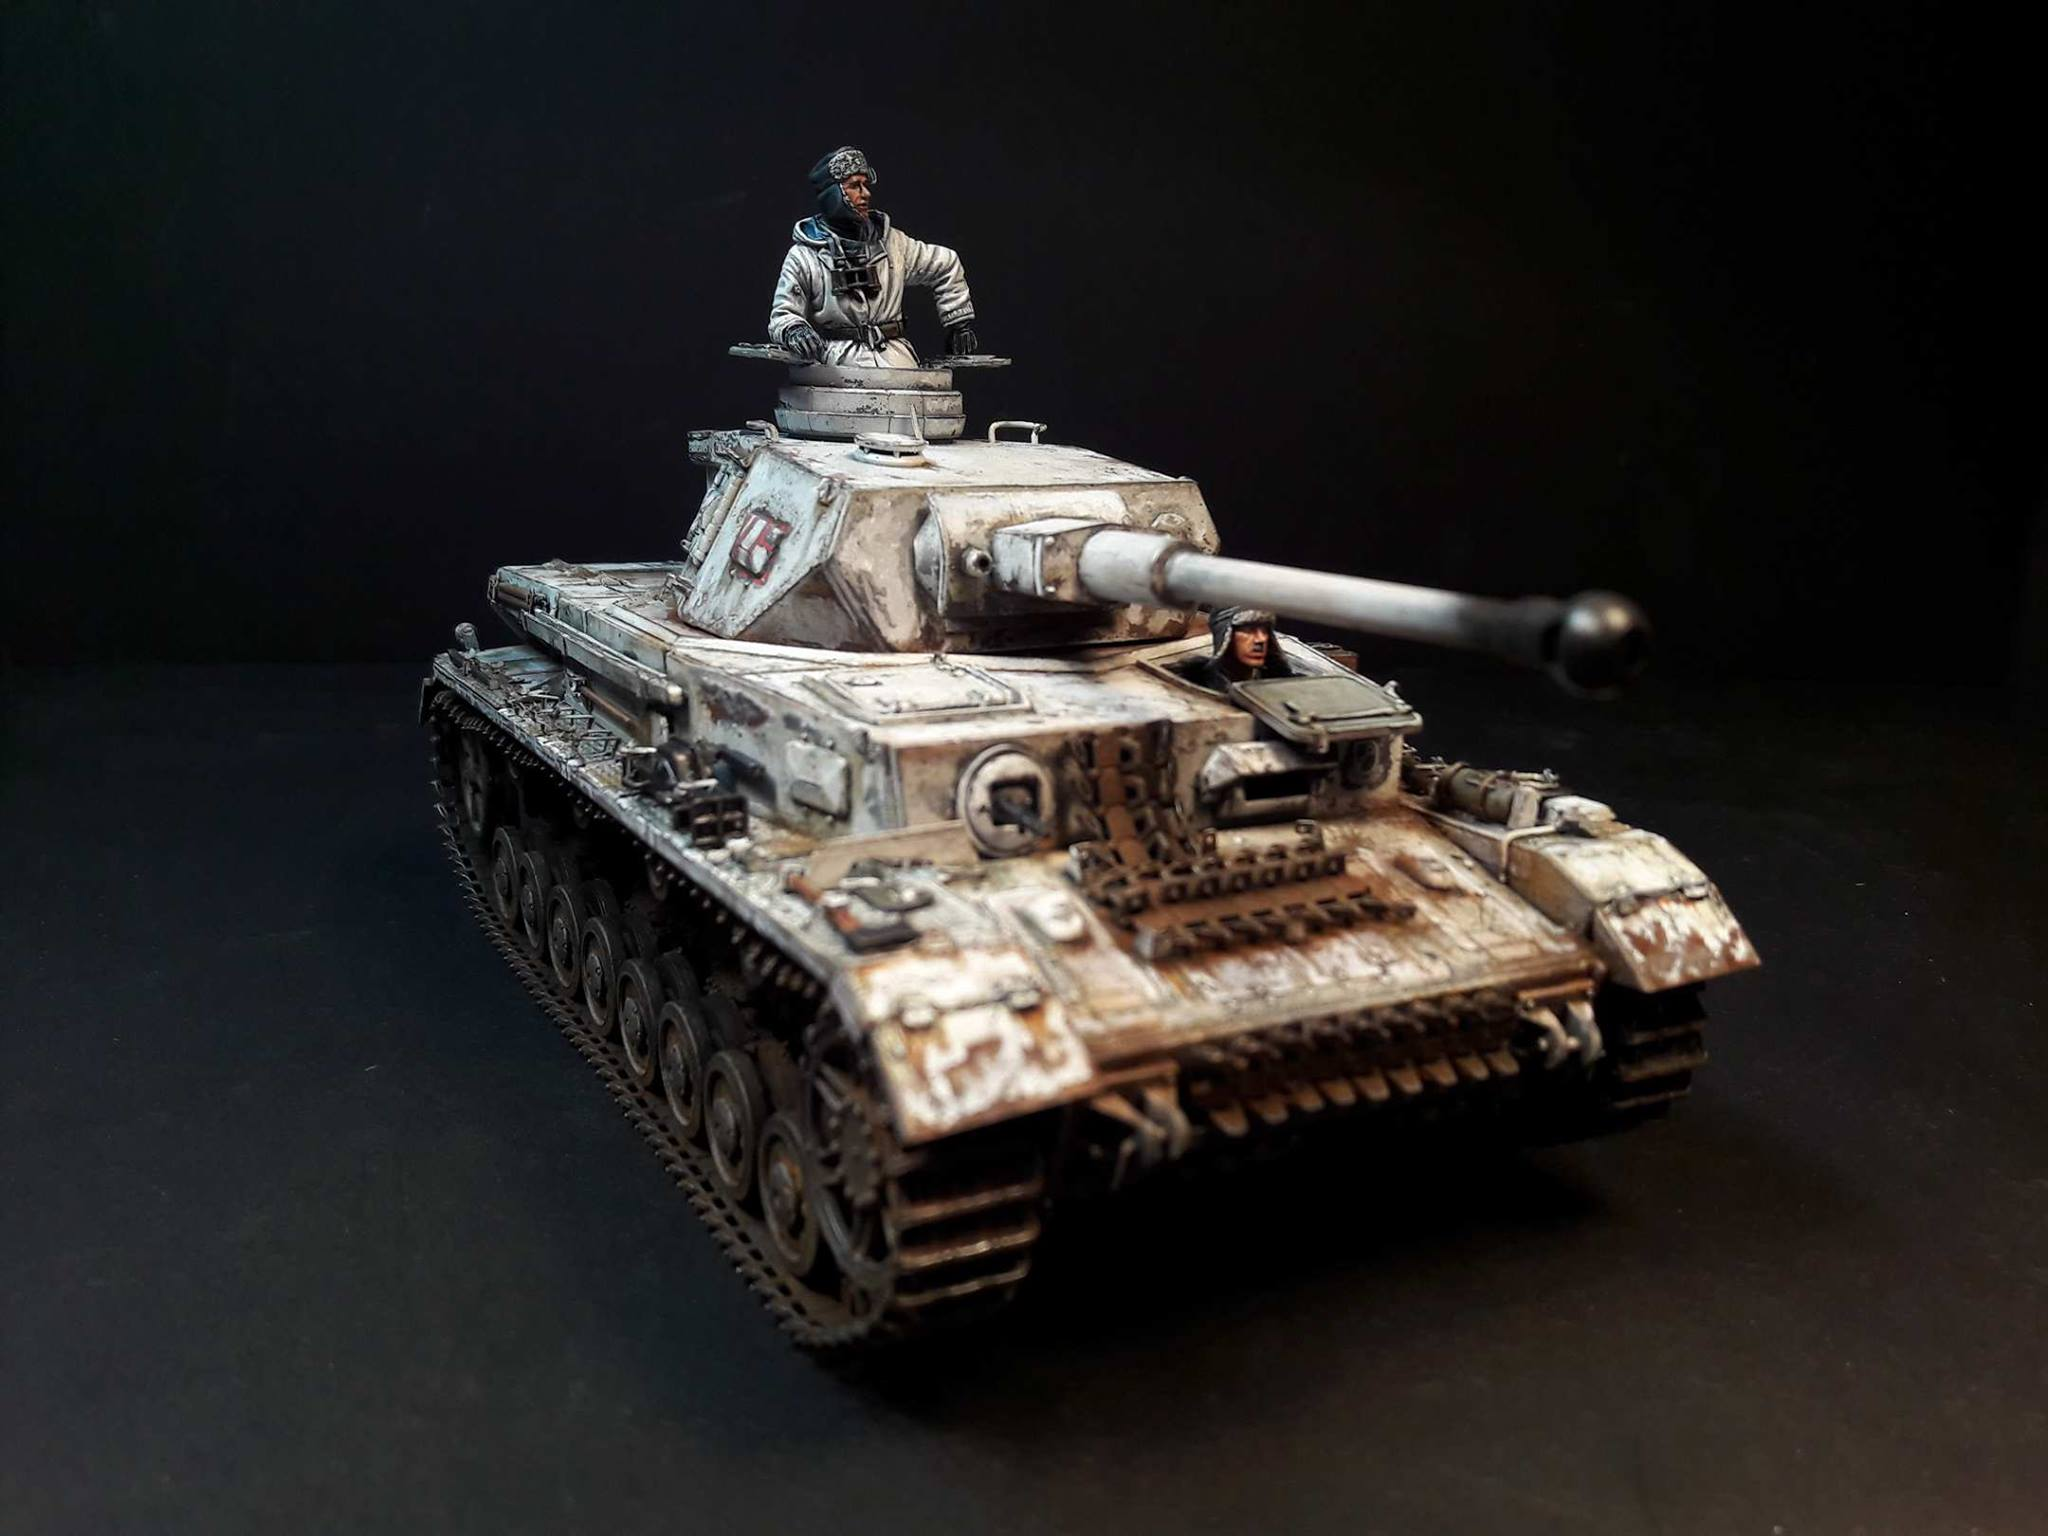 PzKpfw. IV Ausf. F2 - Dragon - Page 3 28149921706242102123508834217301640980534o